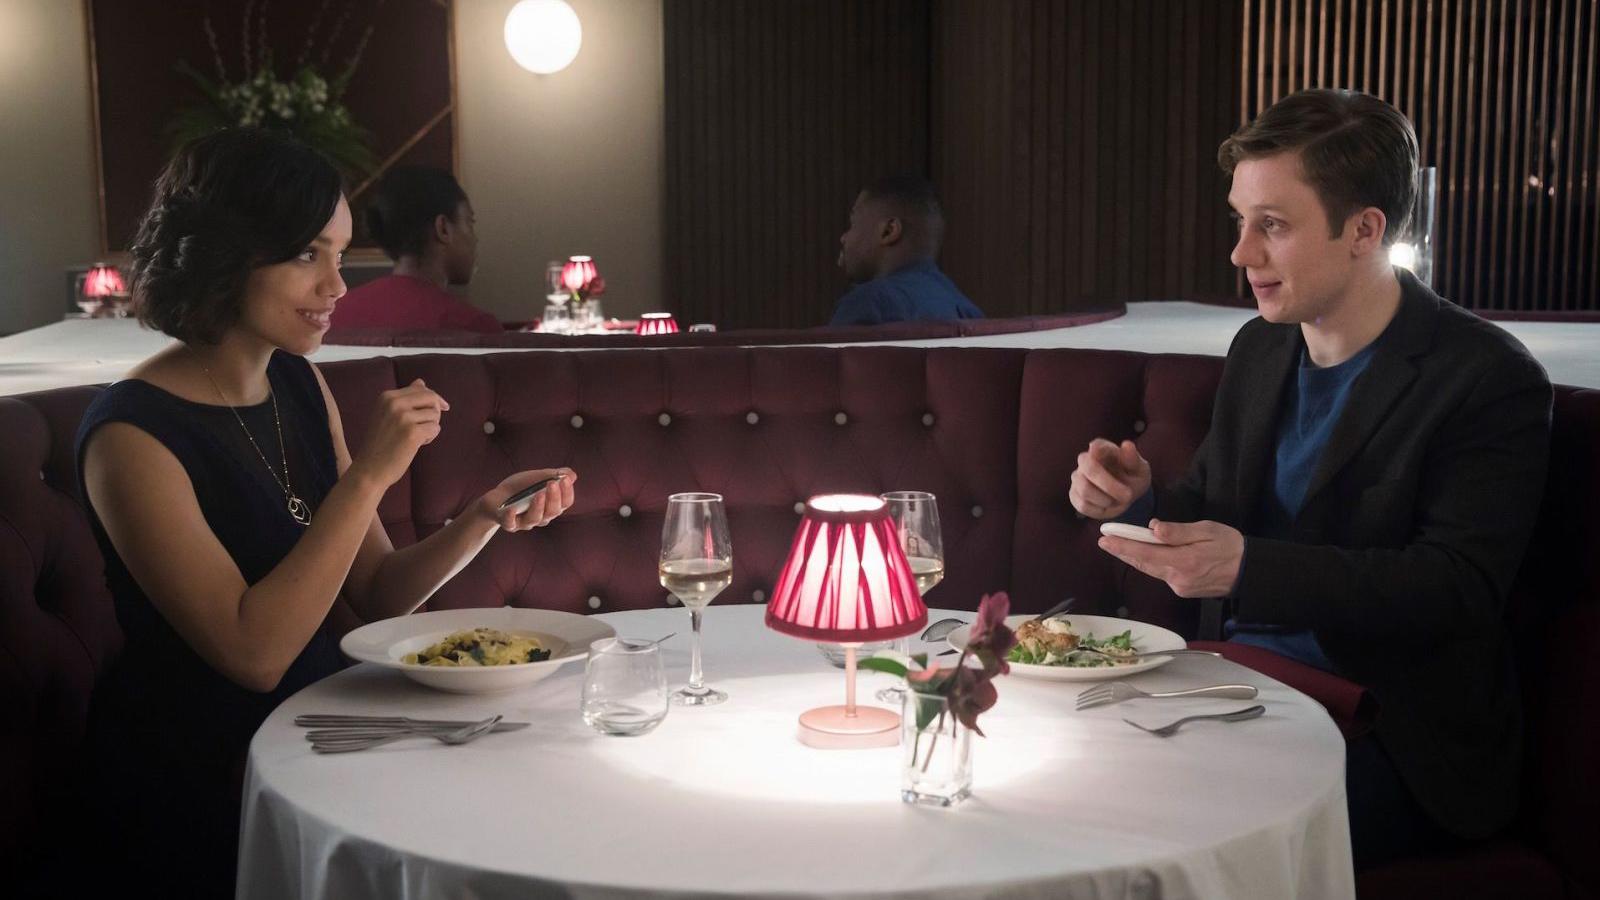 Black Mirror Season 6 on Netflix: will the sci-fi series return